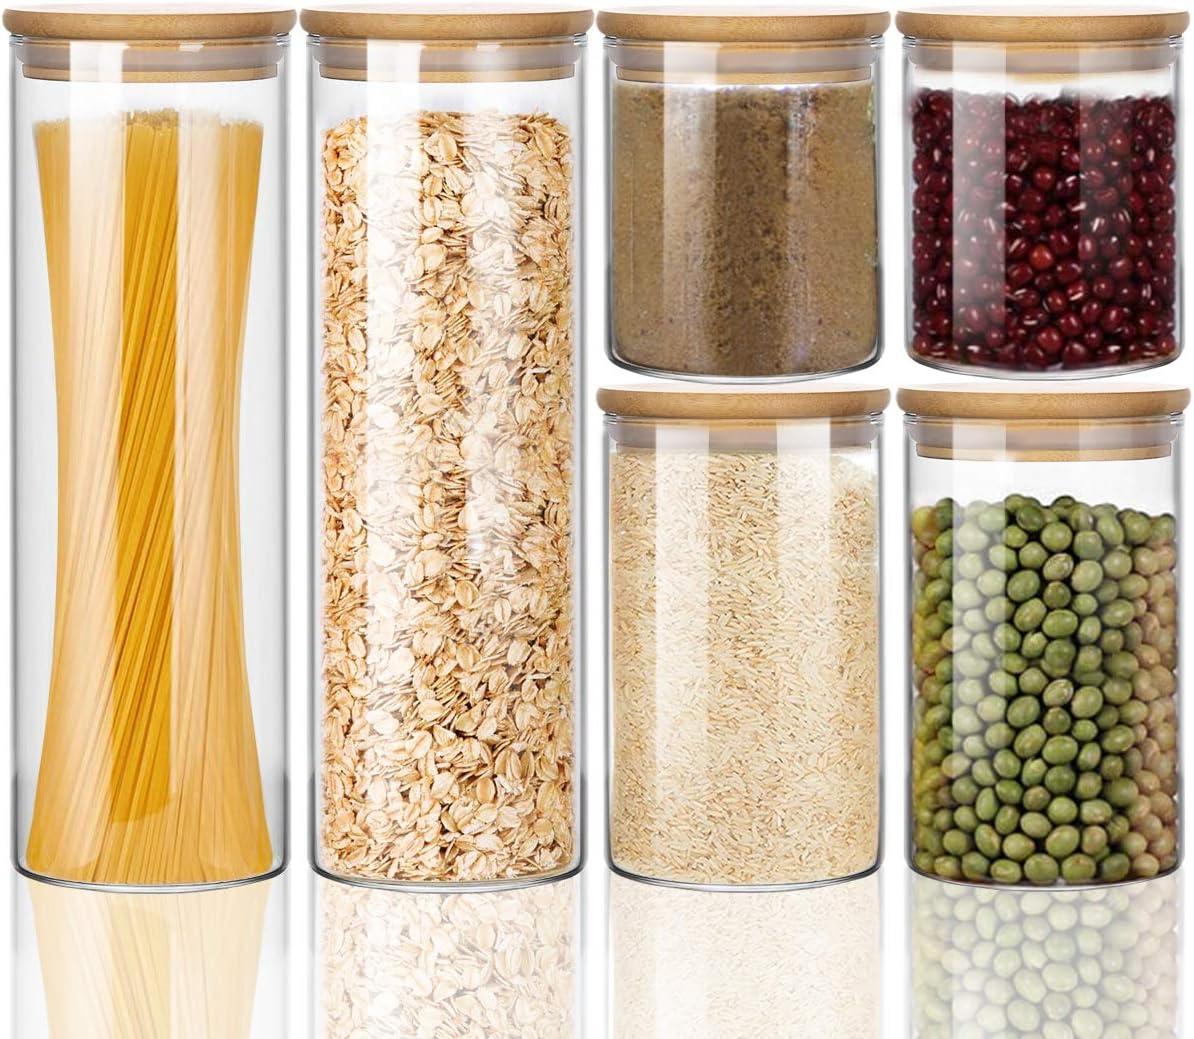 Wennyn Glass Jars for Airtight mart Canister Nashville-Davidson Mall Storage Food